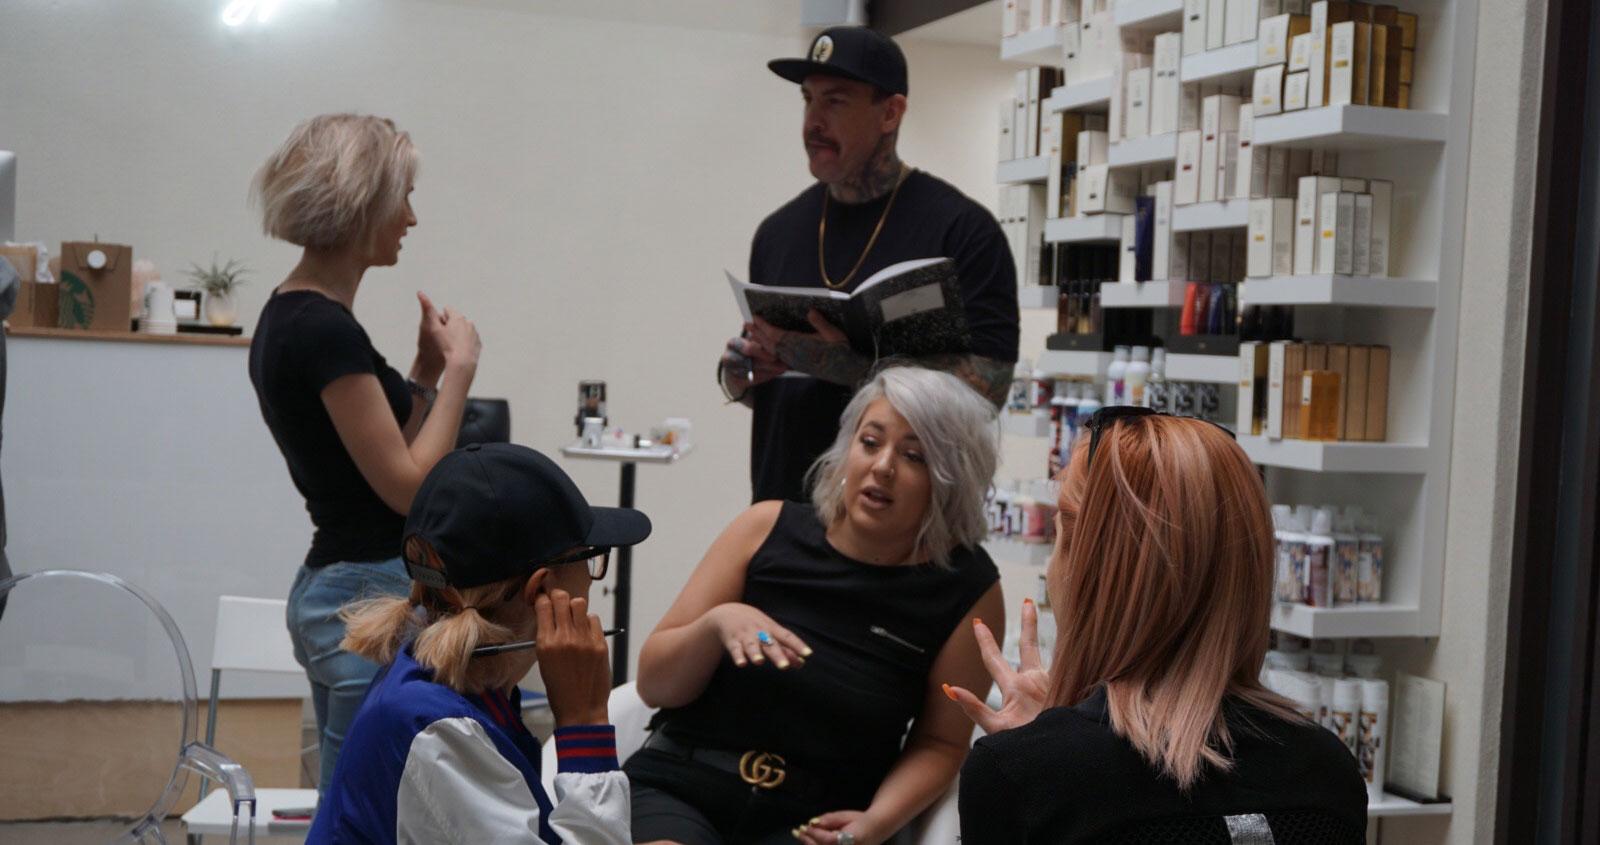 Hair Dresser Reset   Professional Stylist Training by Phillip Rosado